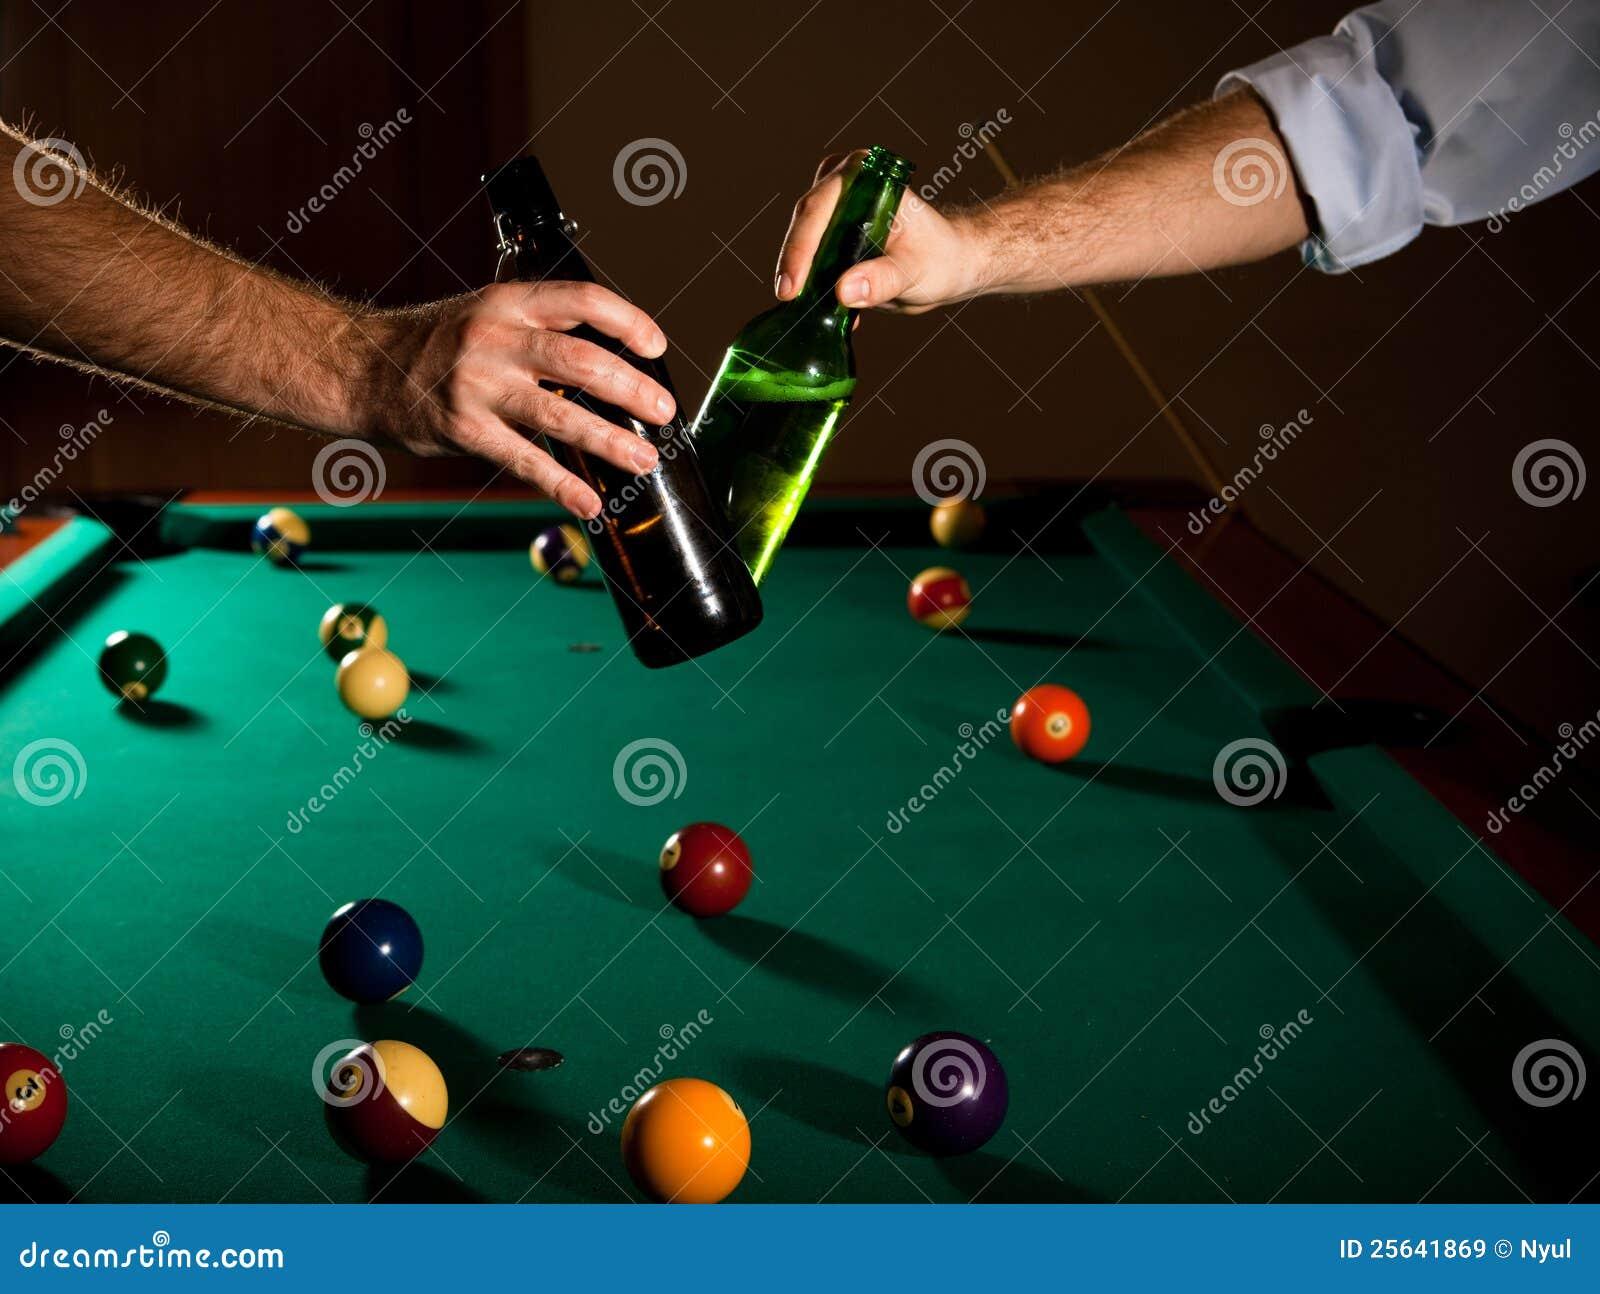 Frascos de cerveja Clinking no snooker